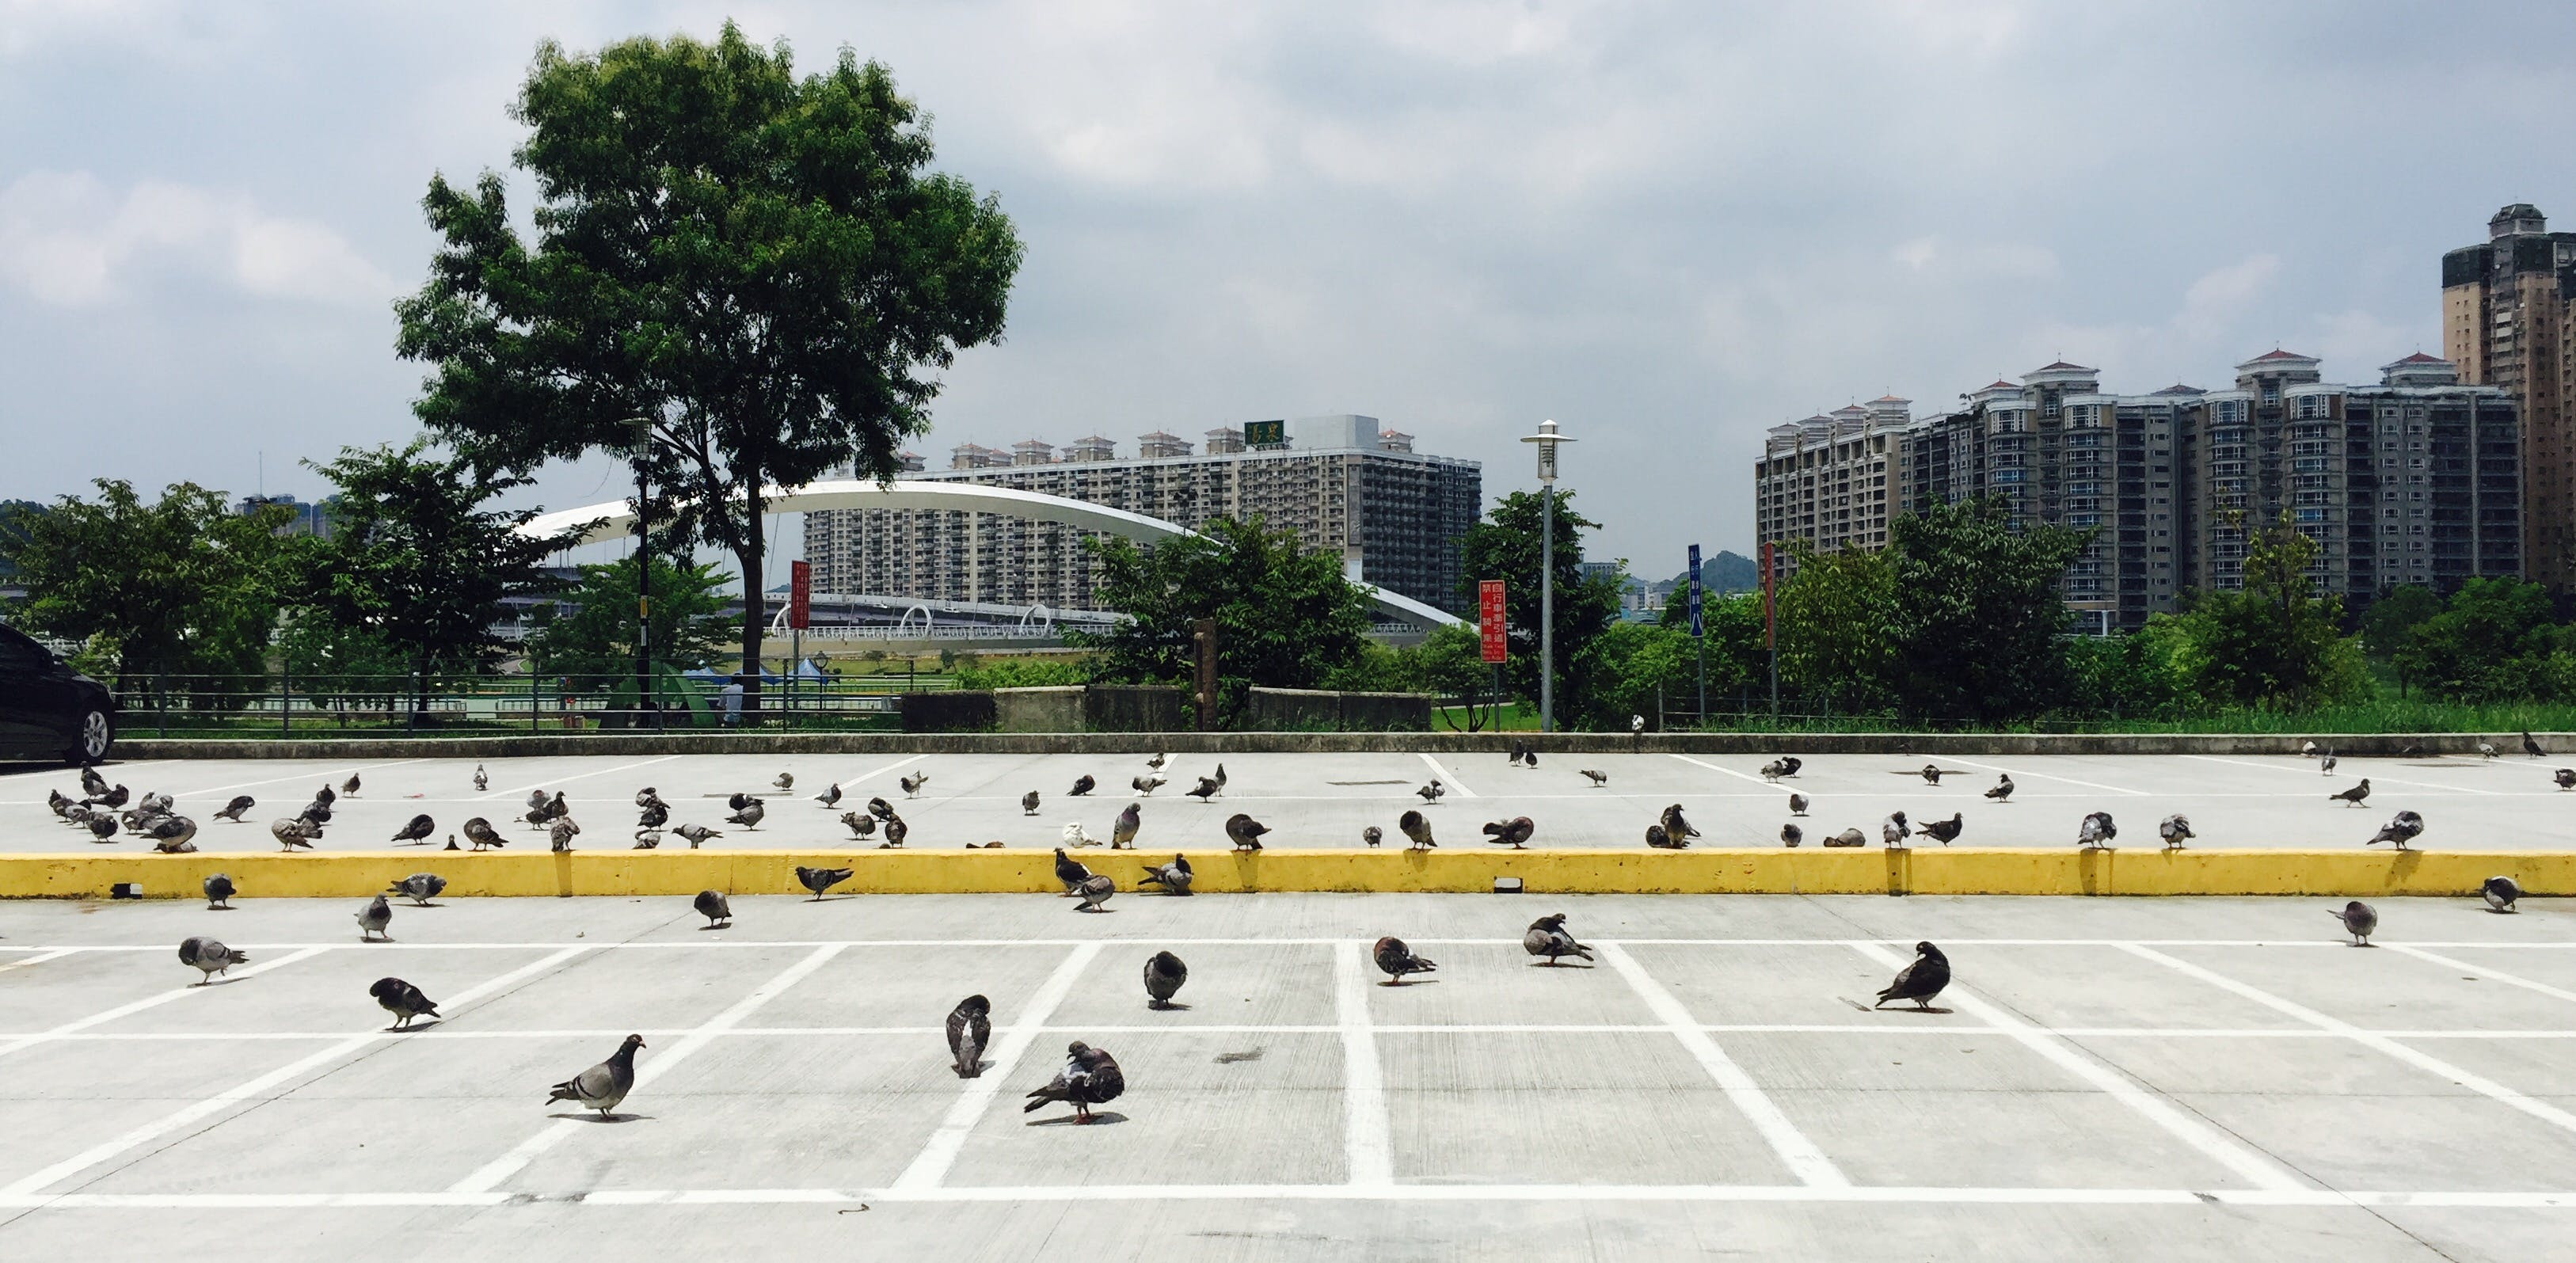 Free stock photo of #mobilechallenge, bird, iphone 6 plus, parking lots